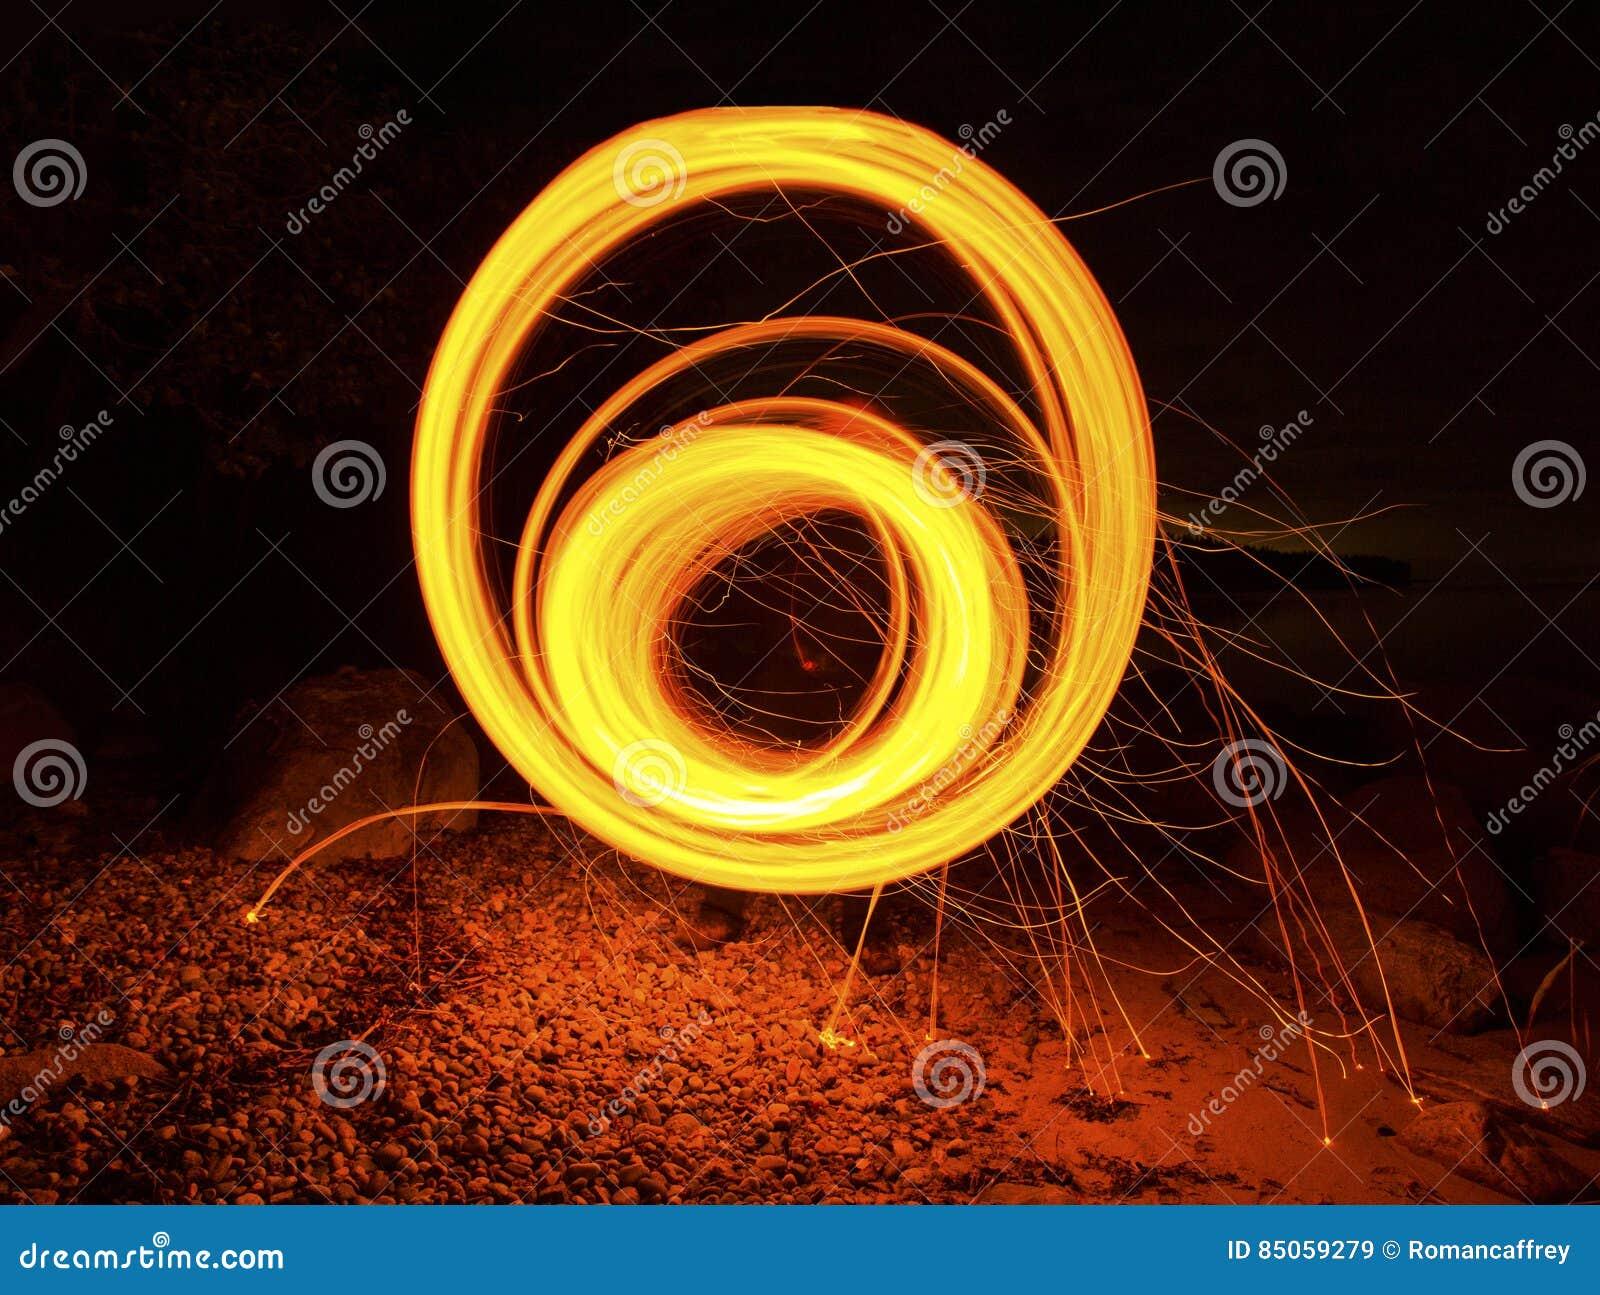 Long exposure fire round circle hypnotizing spinning